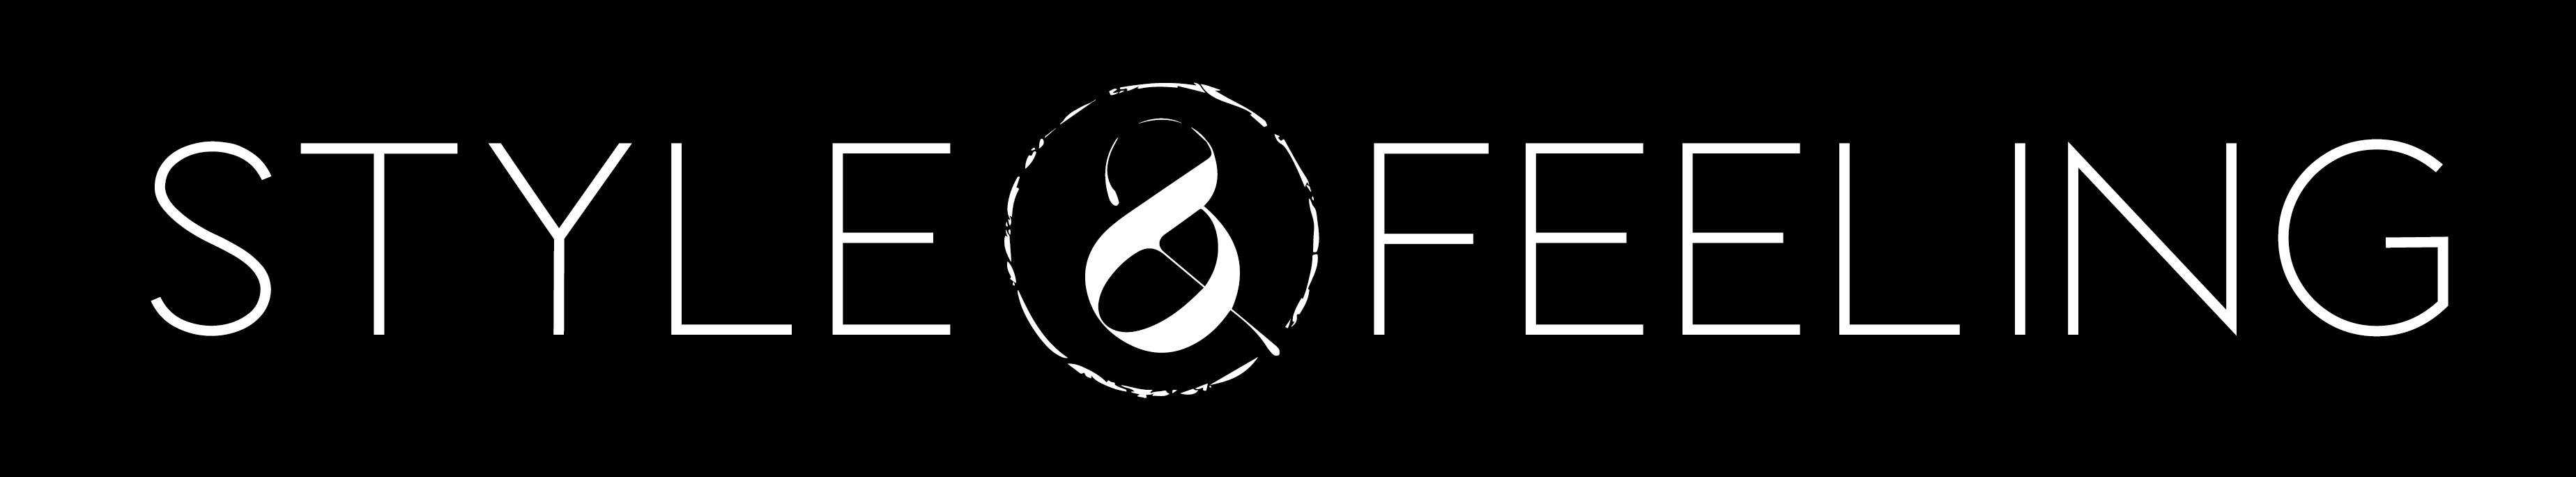 Logo Style and feeling